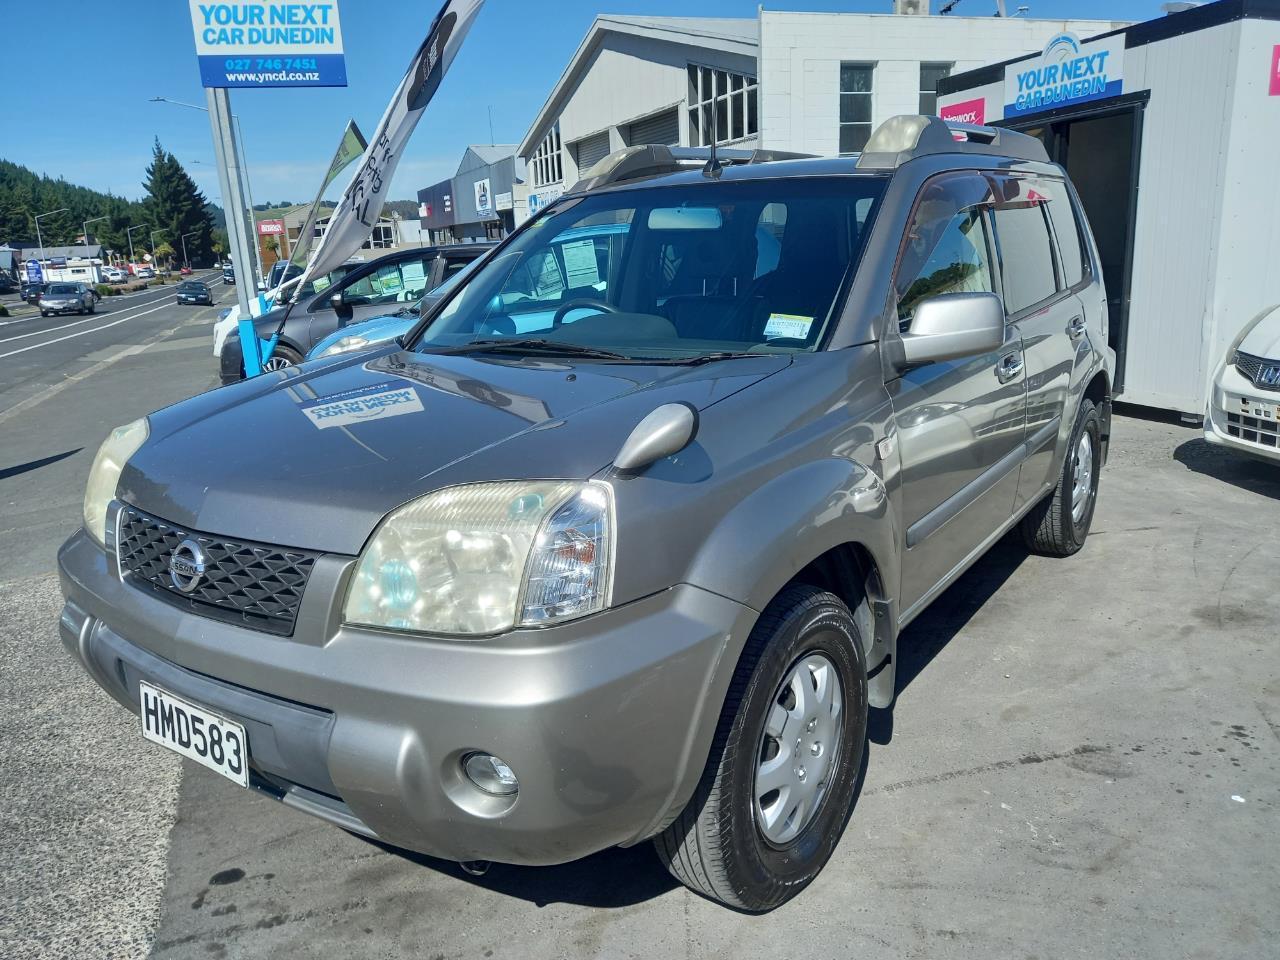 image-6, 2006 Nissan X-Trail 4WD No Deposit Finance at Dunedin